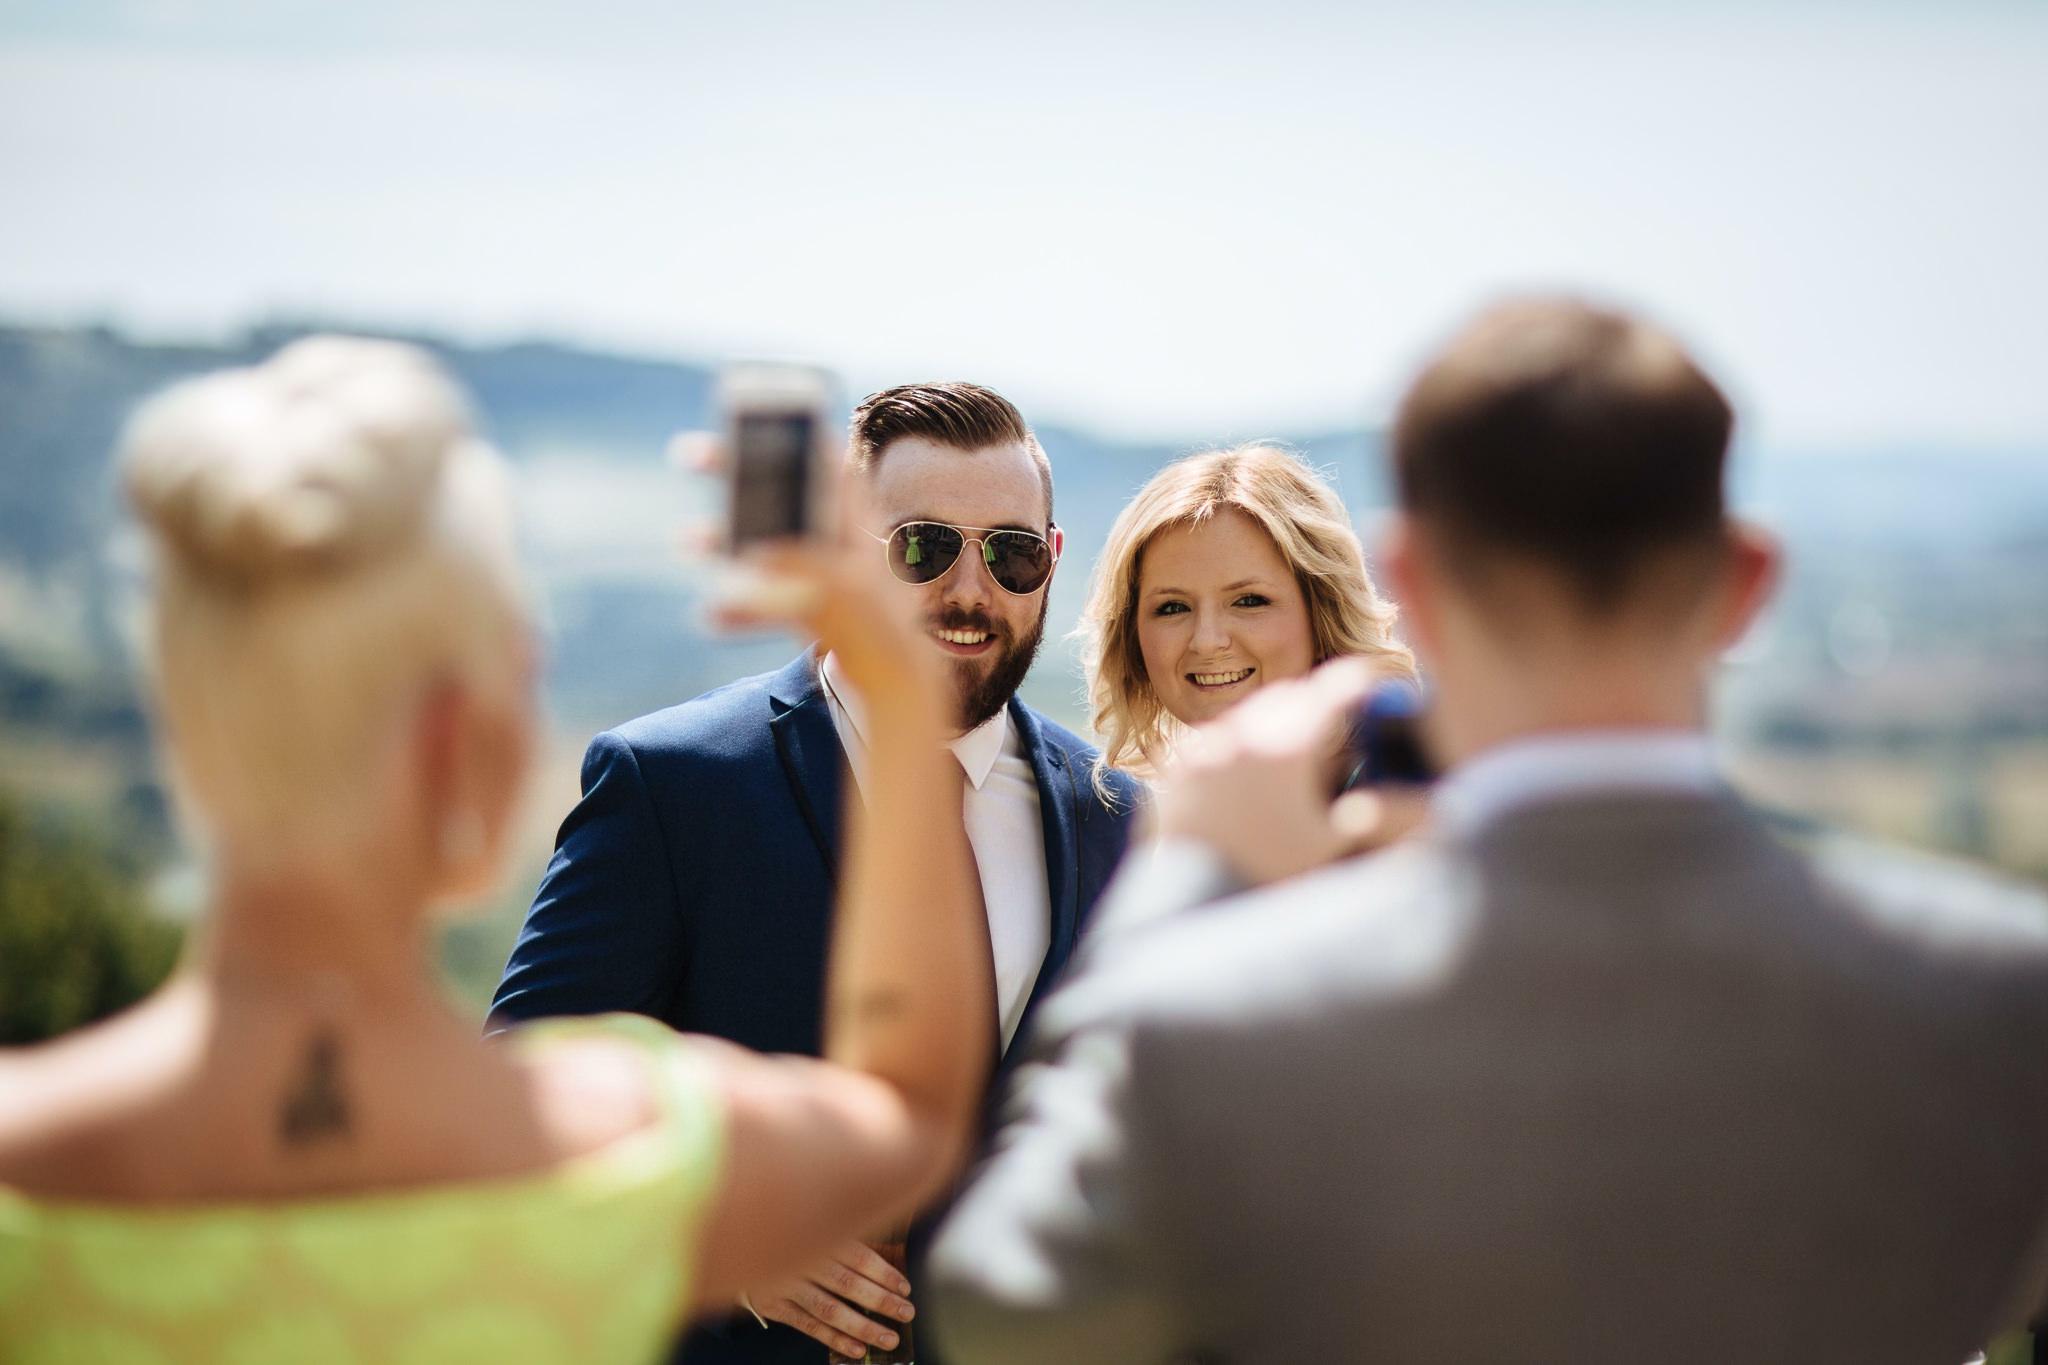 paul-marbrook-Caer-Llan-Wedding-Photographer-90062